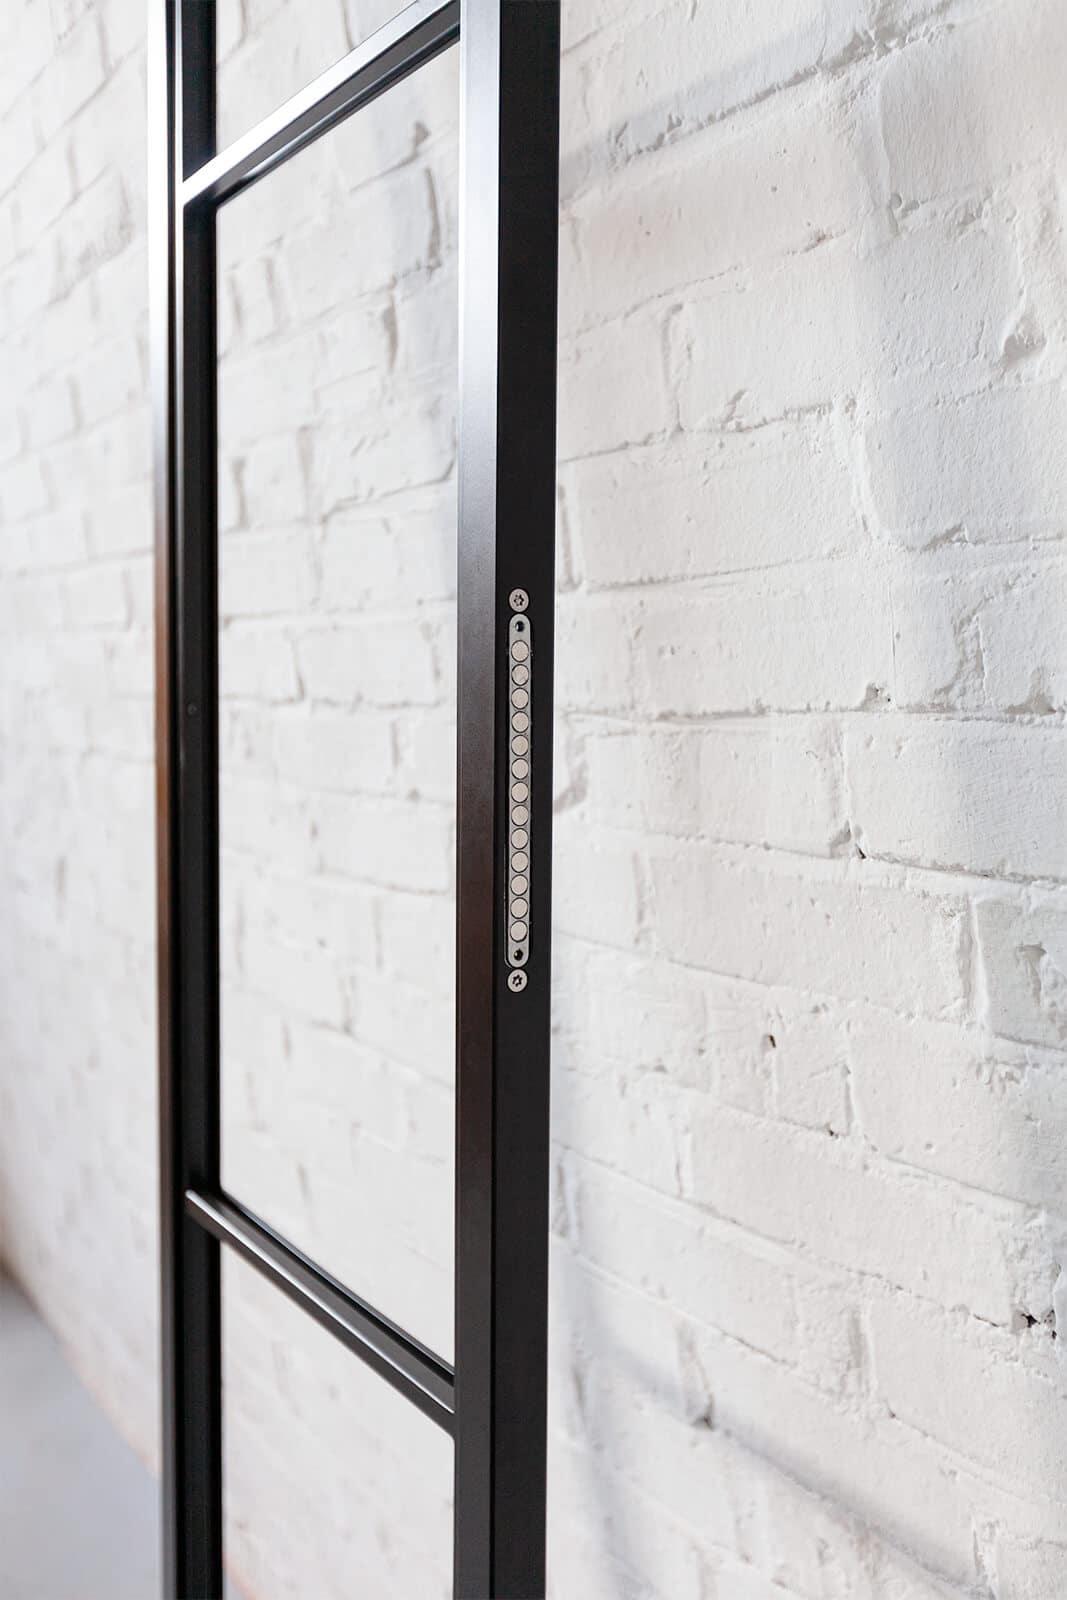 N51E12 - Stahl Loft Tür - Türmagnet, Schliessmagnet, Magnet